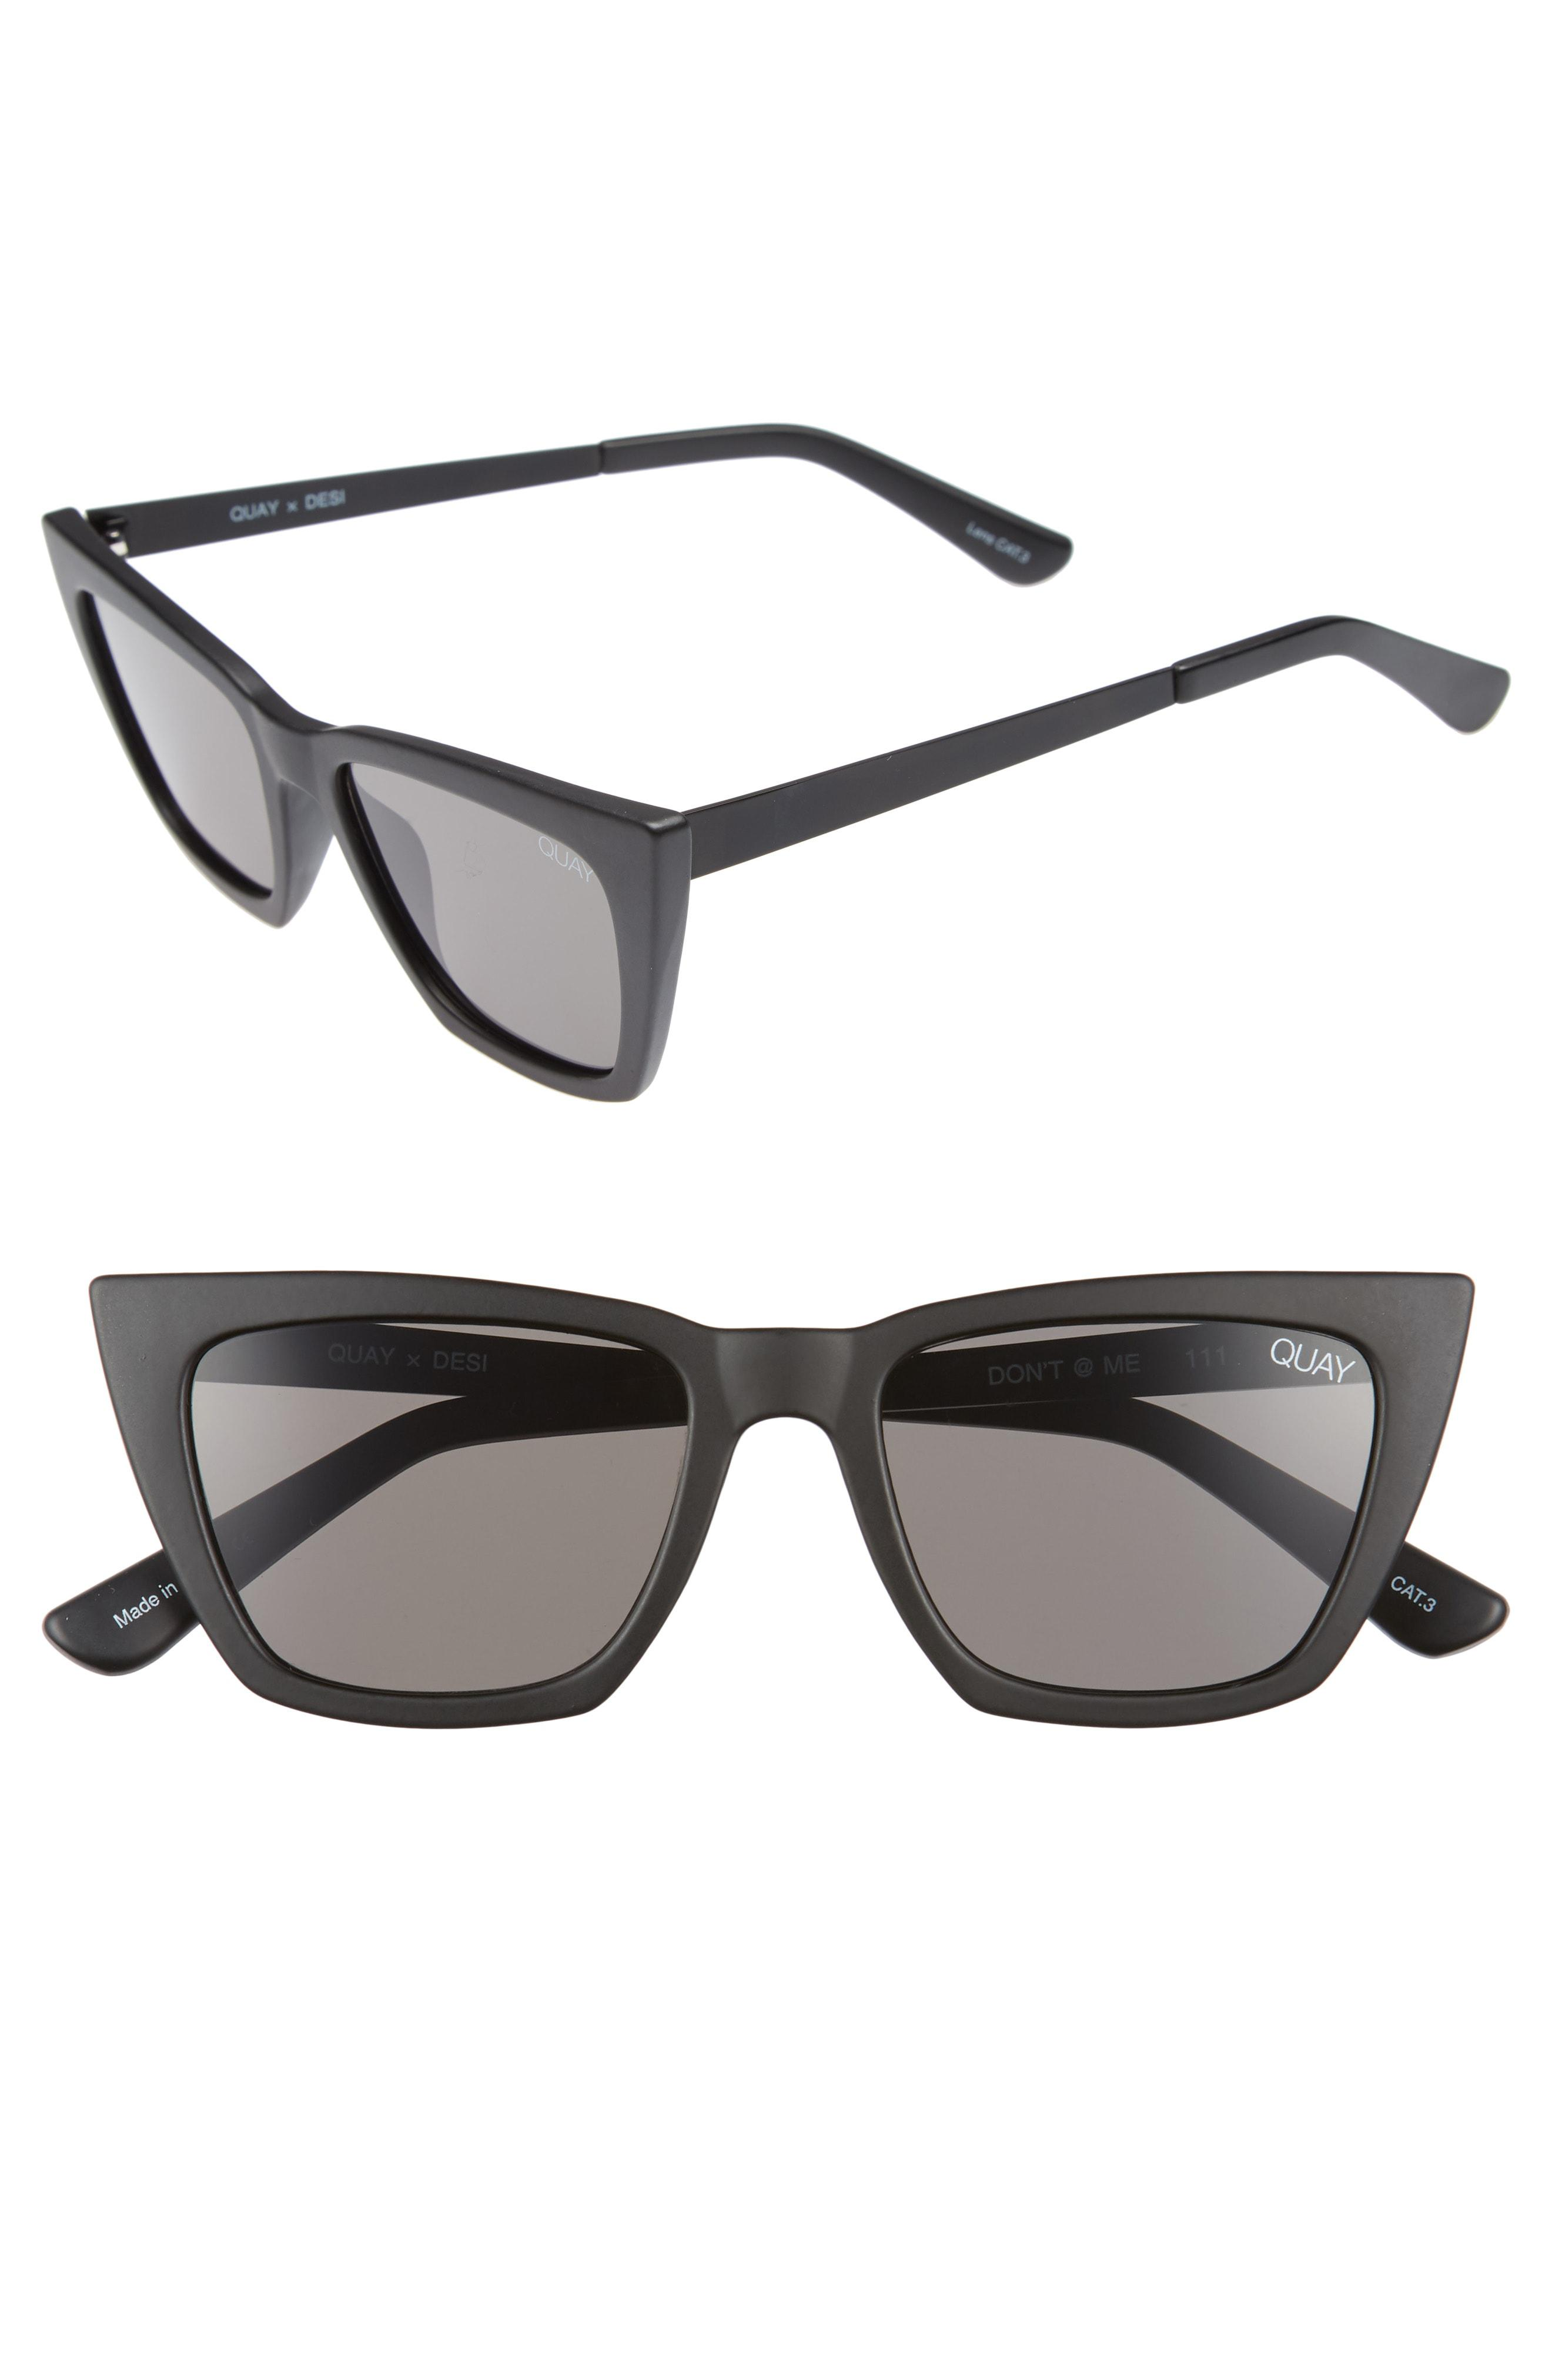 998fb14c865 Quay X Desi Perkins Don t   Me 48mm Cat Eye Sunglasses in Black - Lyst